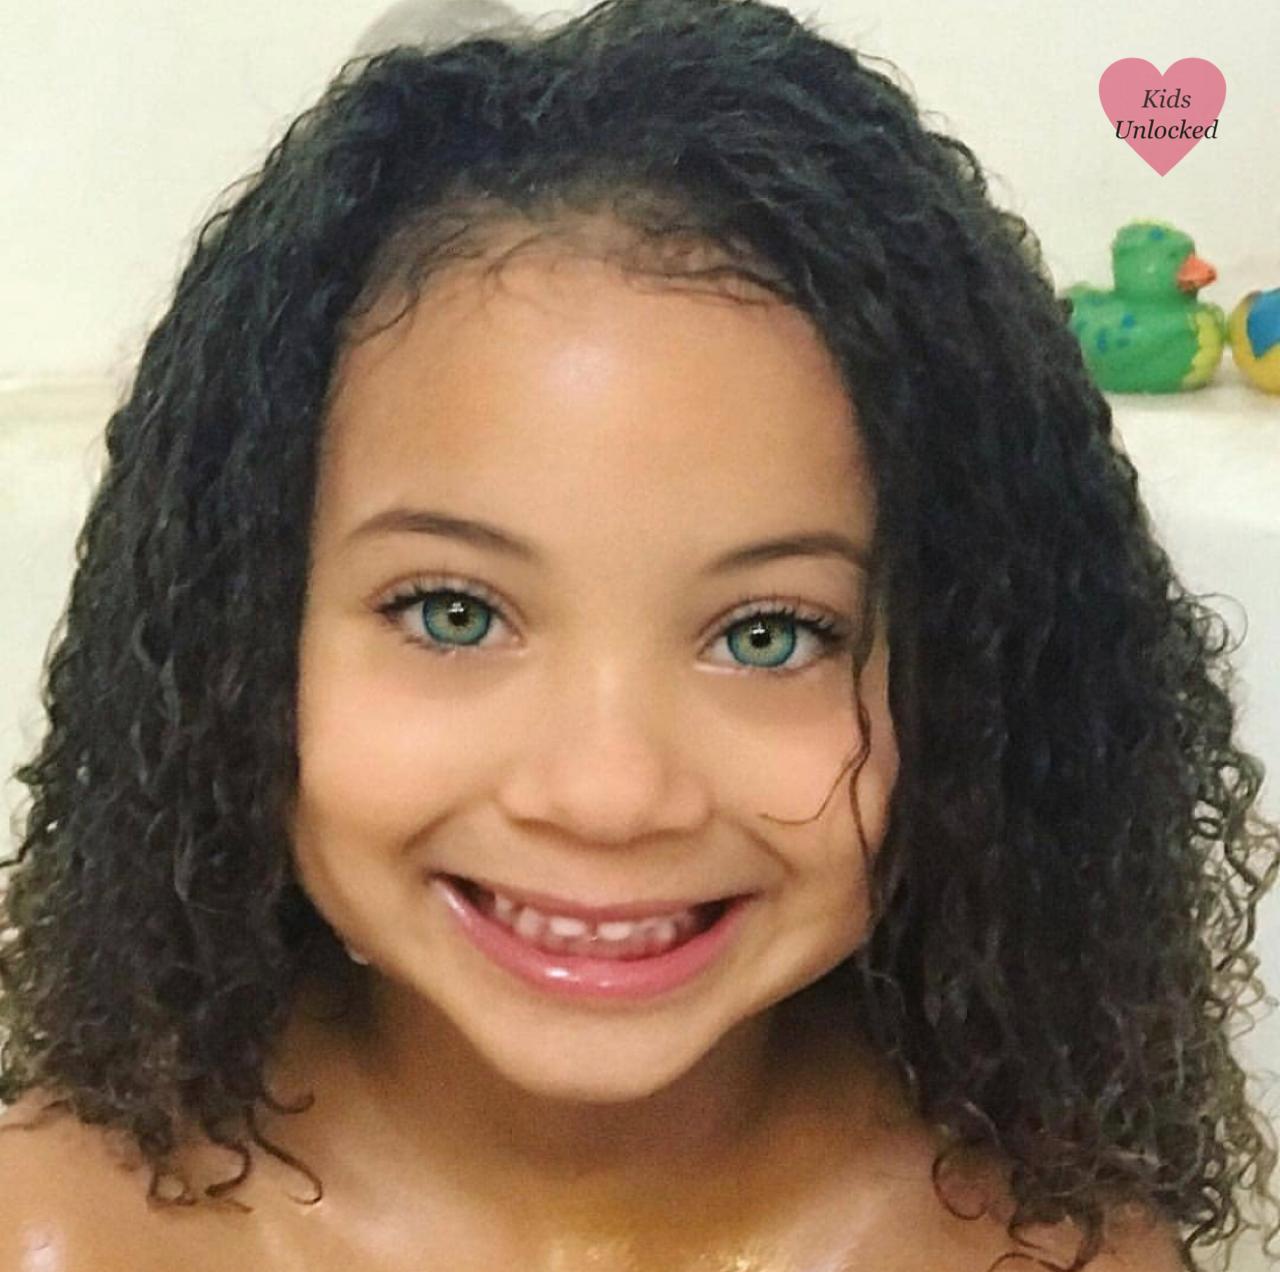 Jurnee Lee 5 Years African American Caucasian Follow Instagram Com Kidsunlockedig Curly Girl Hairstyles Girl With Green Eyes Curly Hair Styles